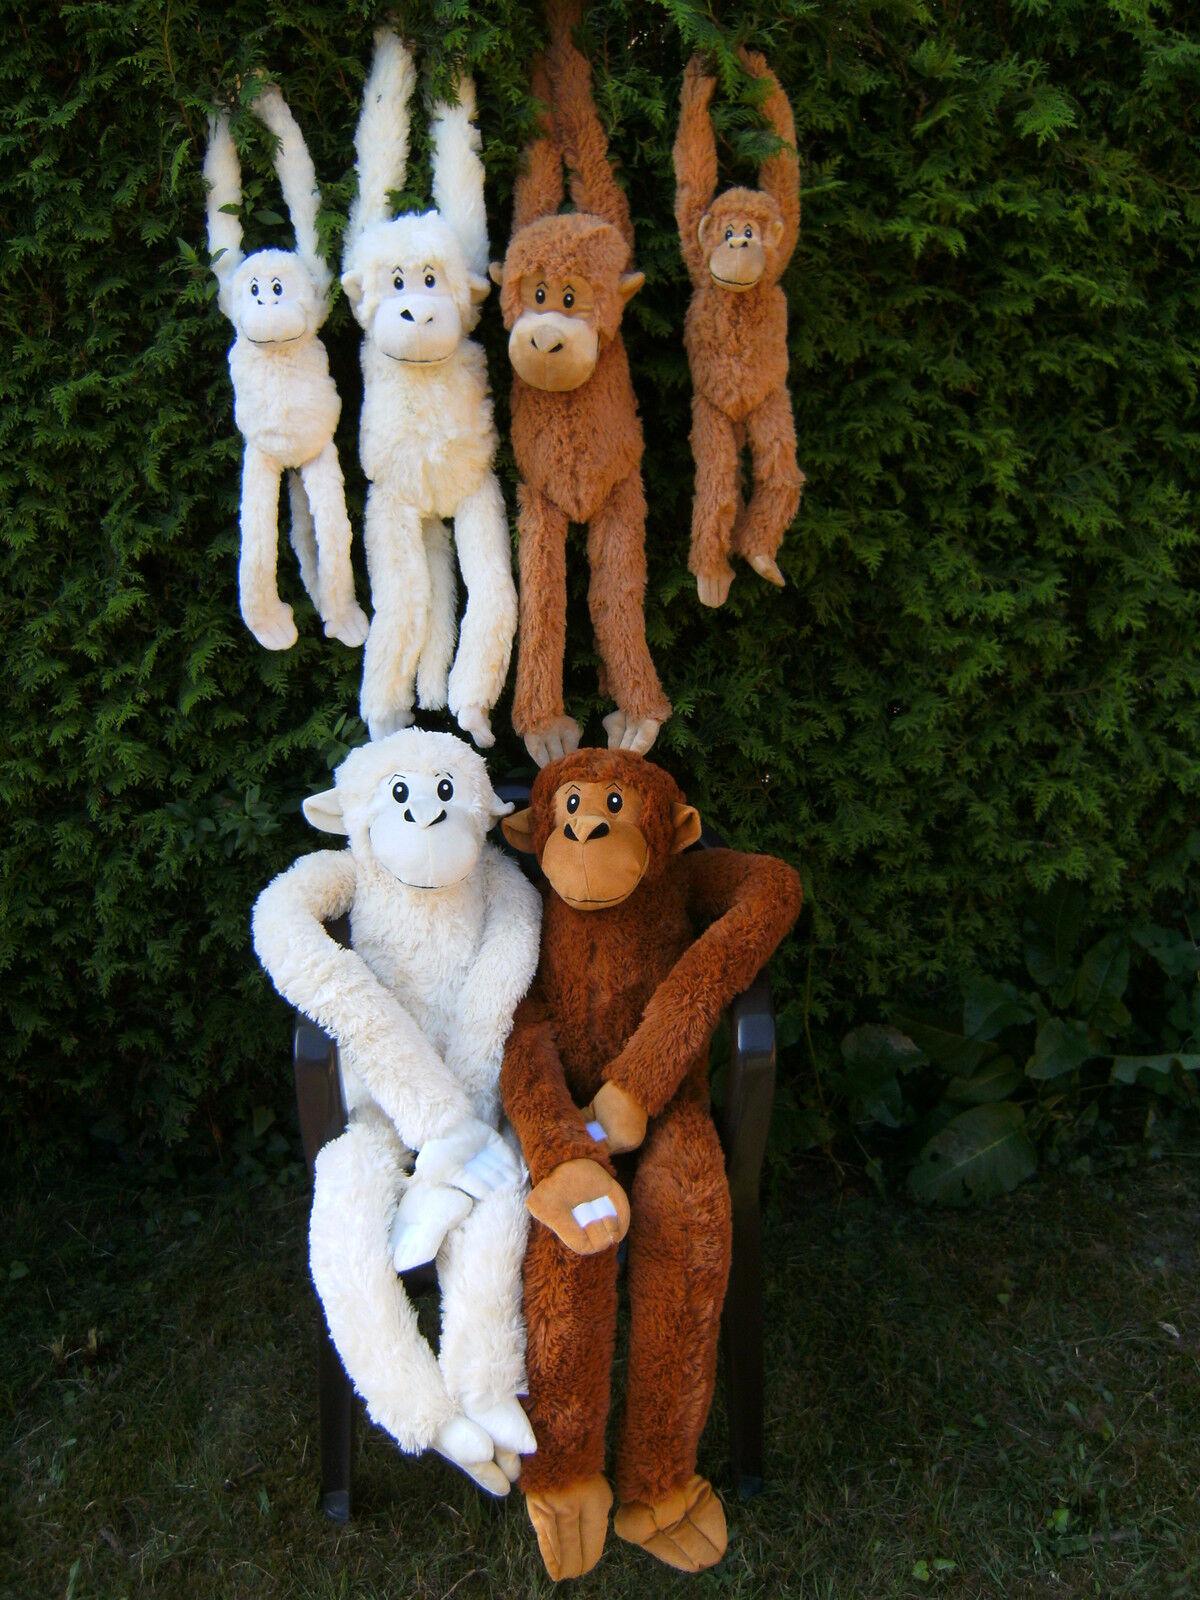 1 Plüschtier Affe 70-145 cm Affen Hängeaffen Stofftier Kuscheltiere Hängeaffe NW